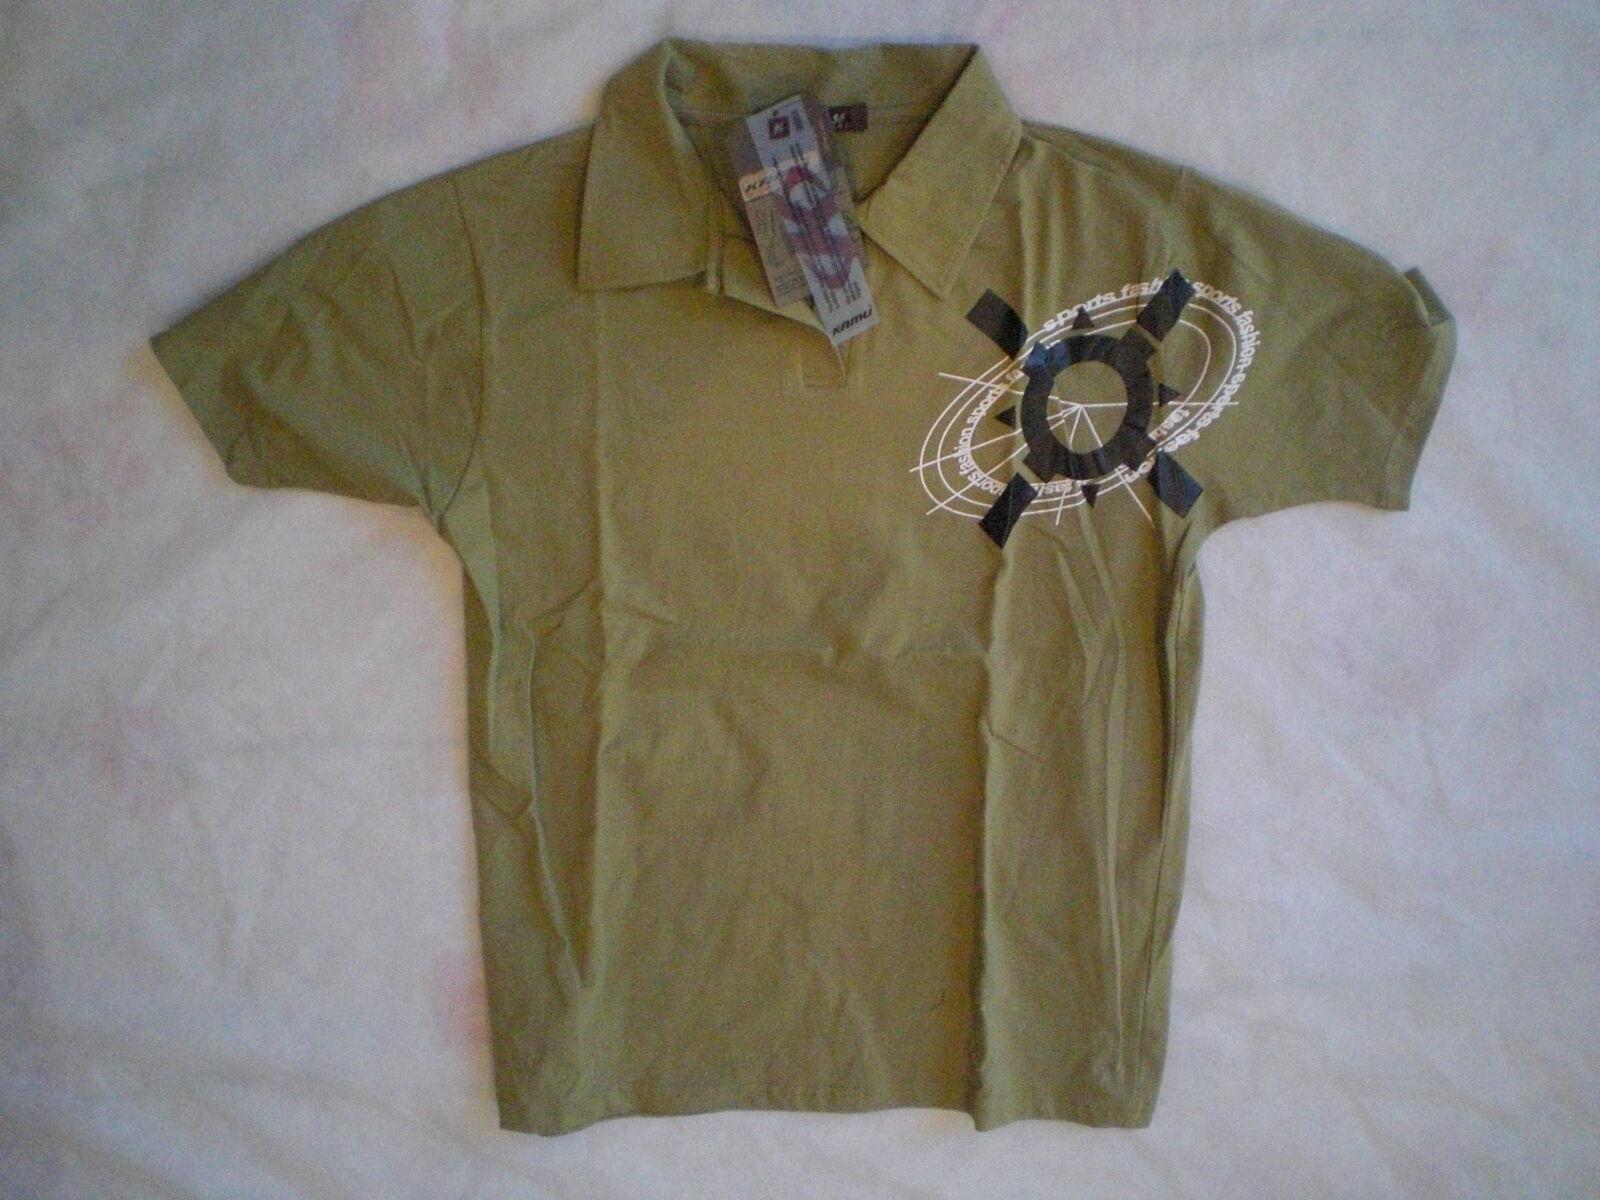 POLO shirt man Size XXL NEW man t-shirt confecciones caymaris REF. 1-17